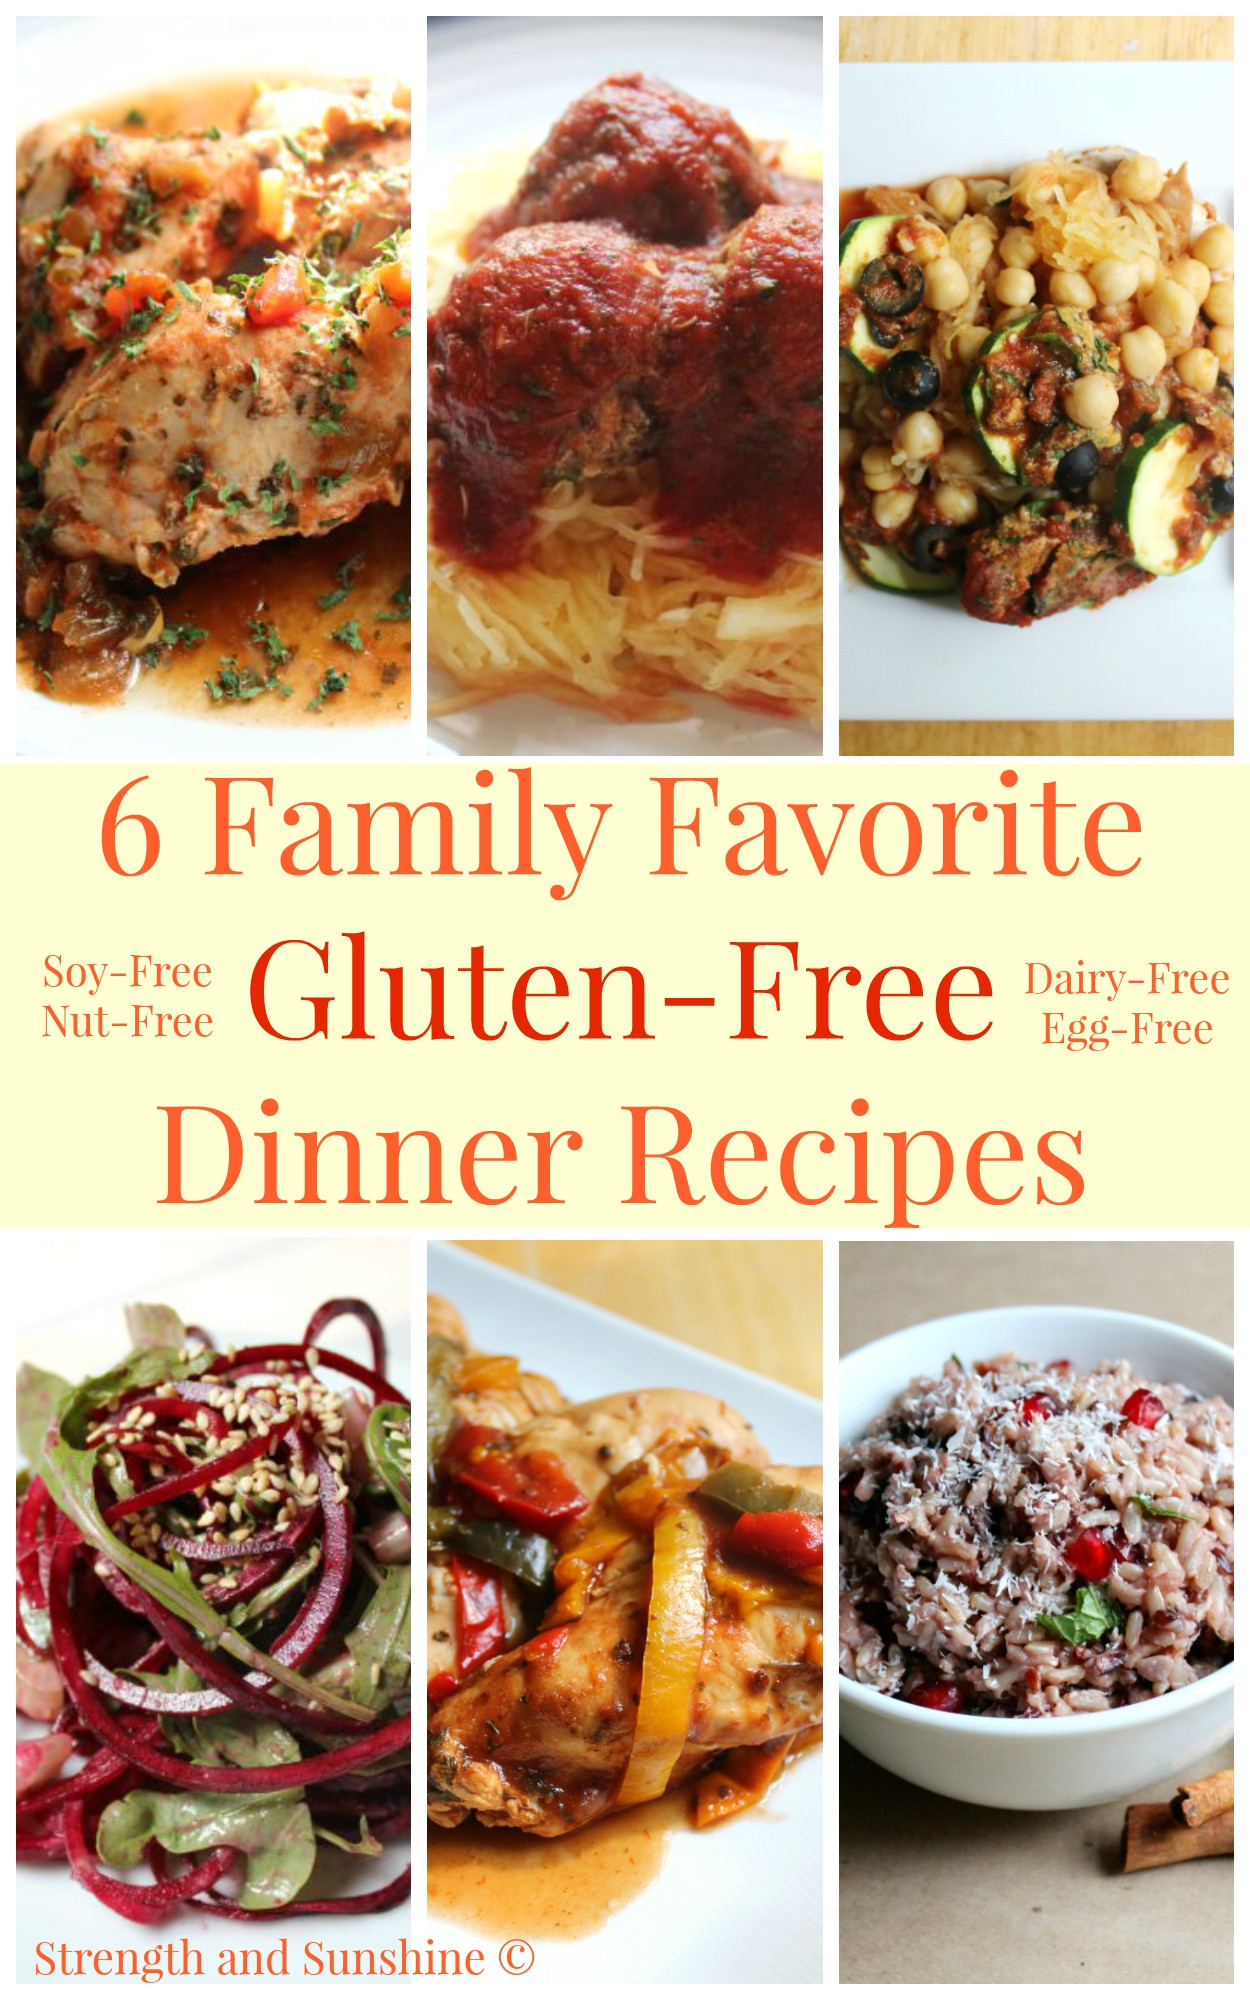 Gluten Free Dairy Free Dinner Recipes  6 Family Favorite Gluten Free Dinner Recipes